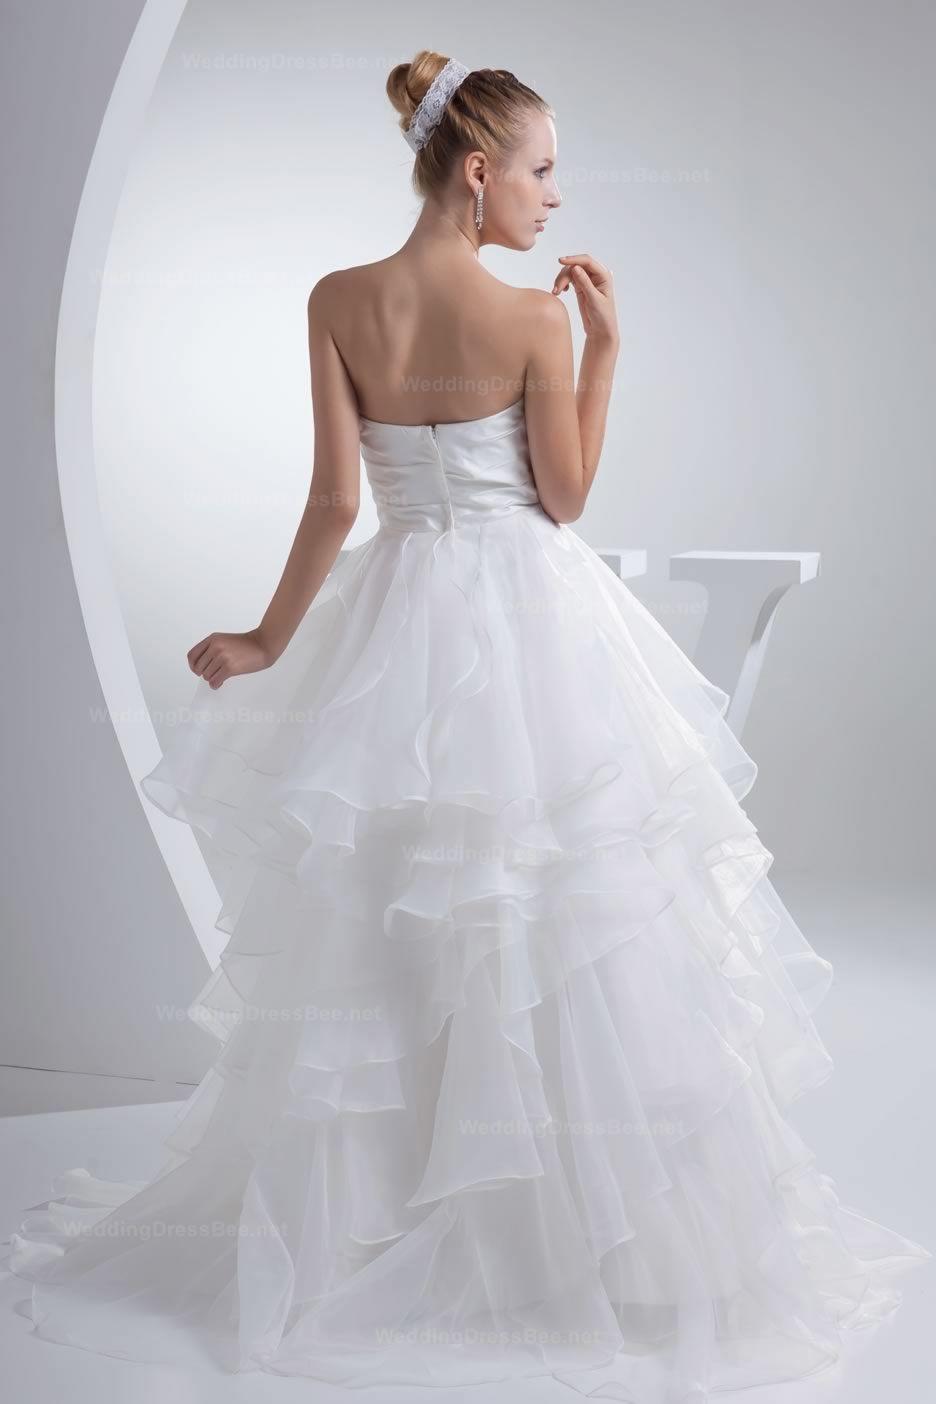 Sheer wedding dress  Pretty Satin Bodice Ruffled Sheer Organza Bottom Bow Wedding Dress